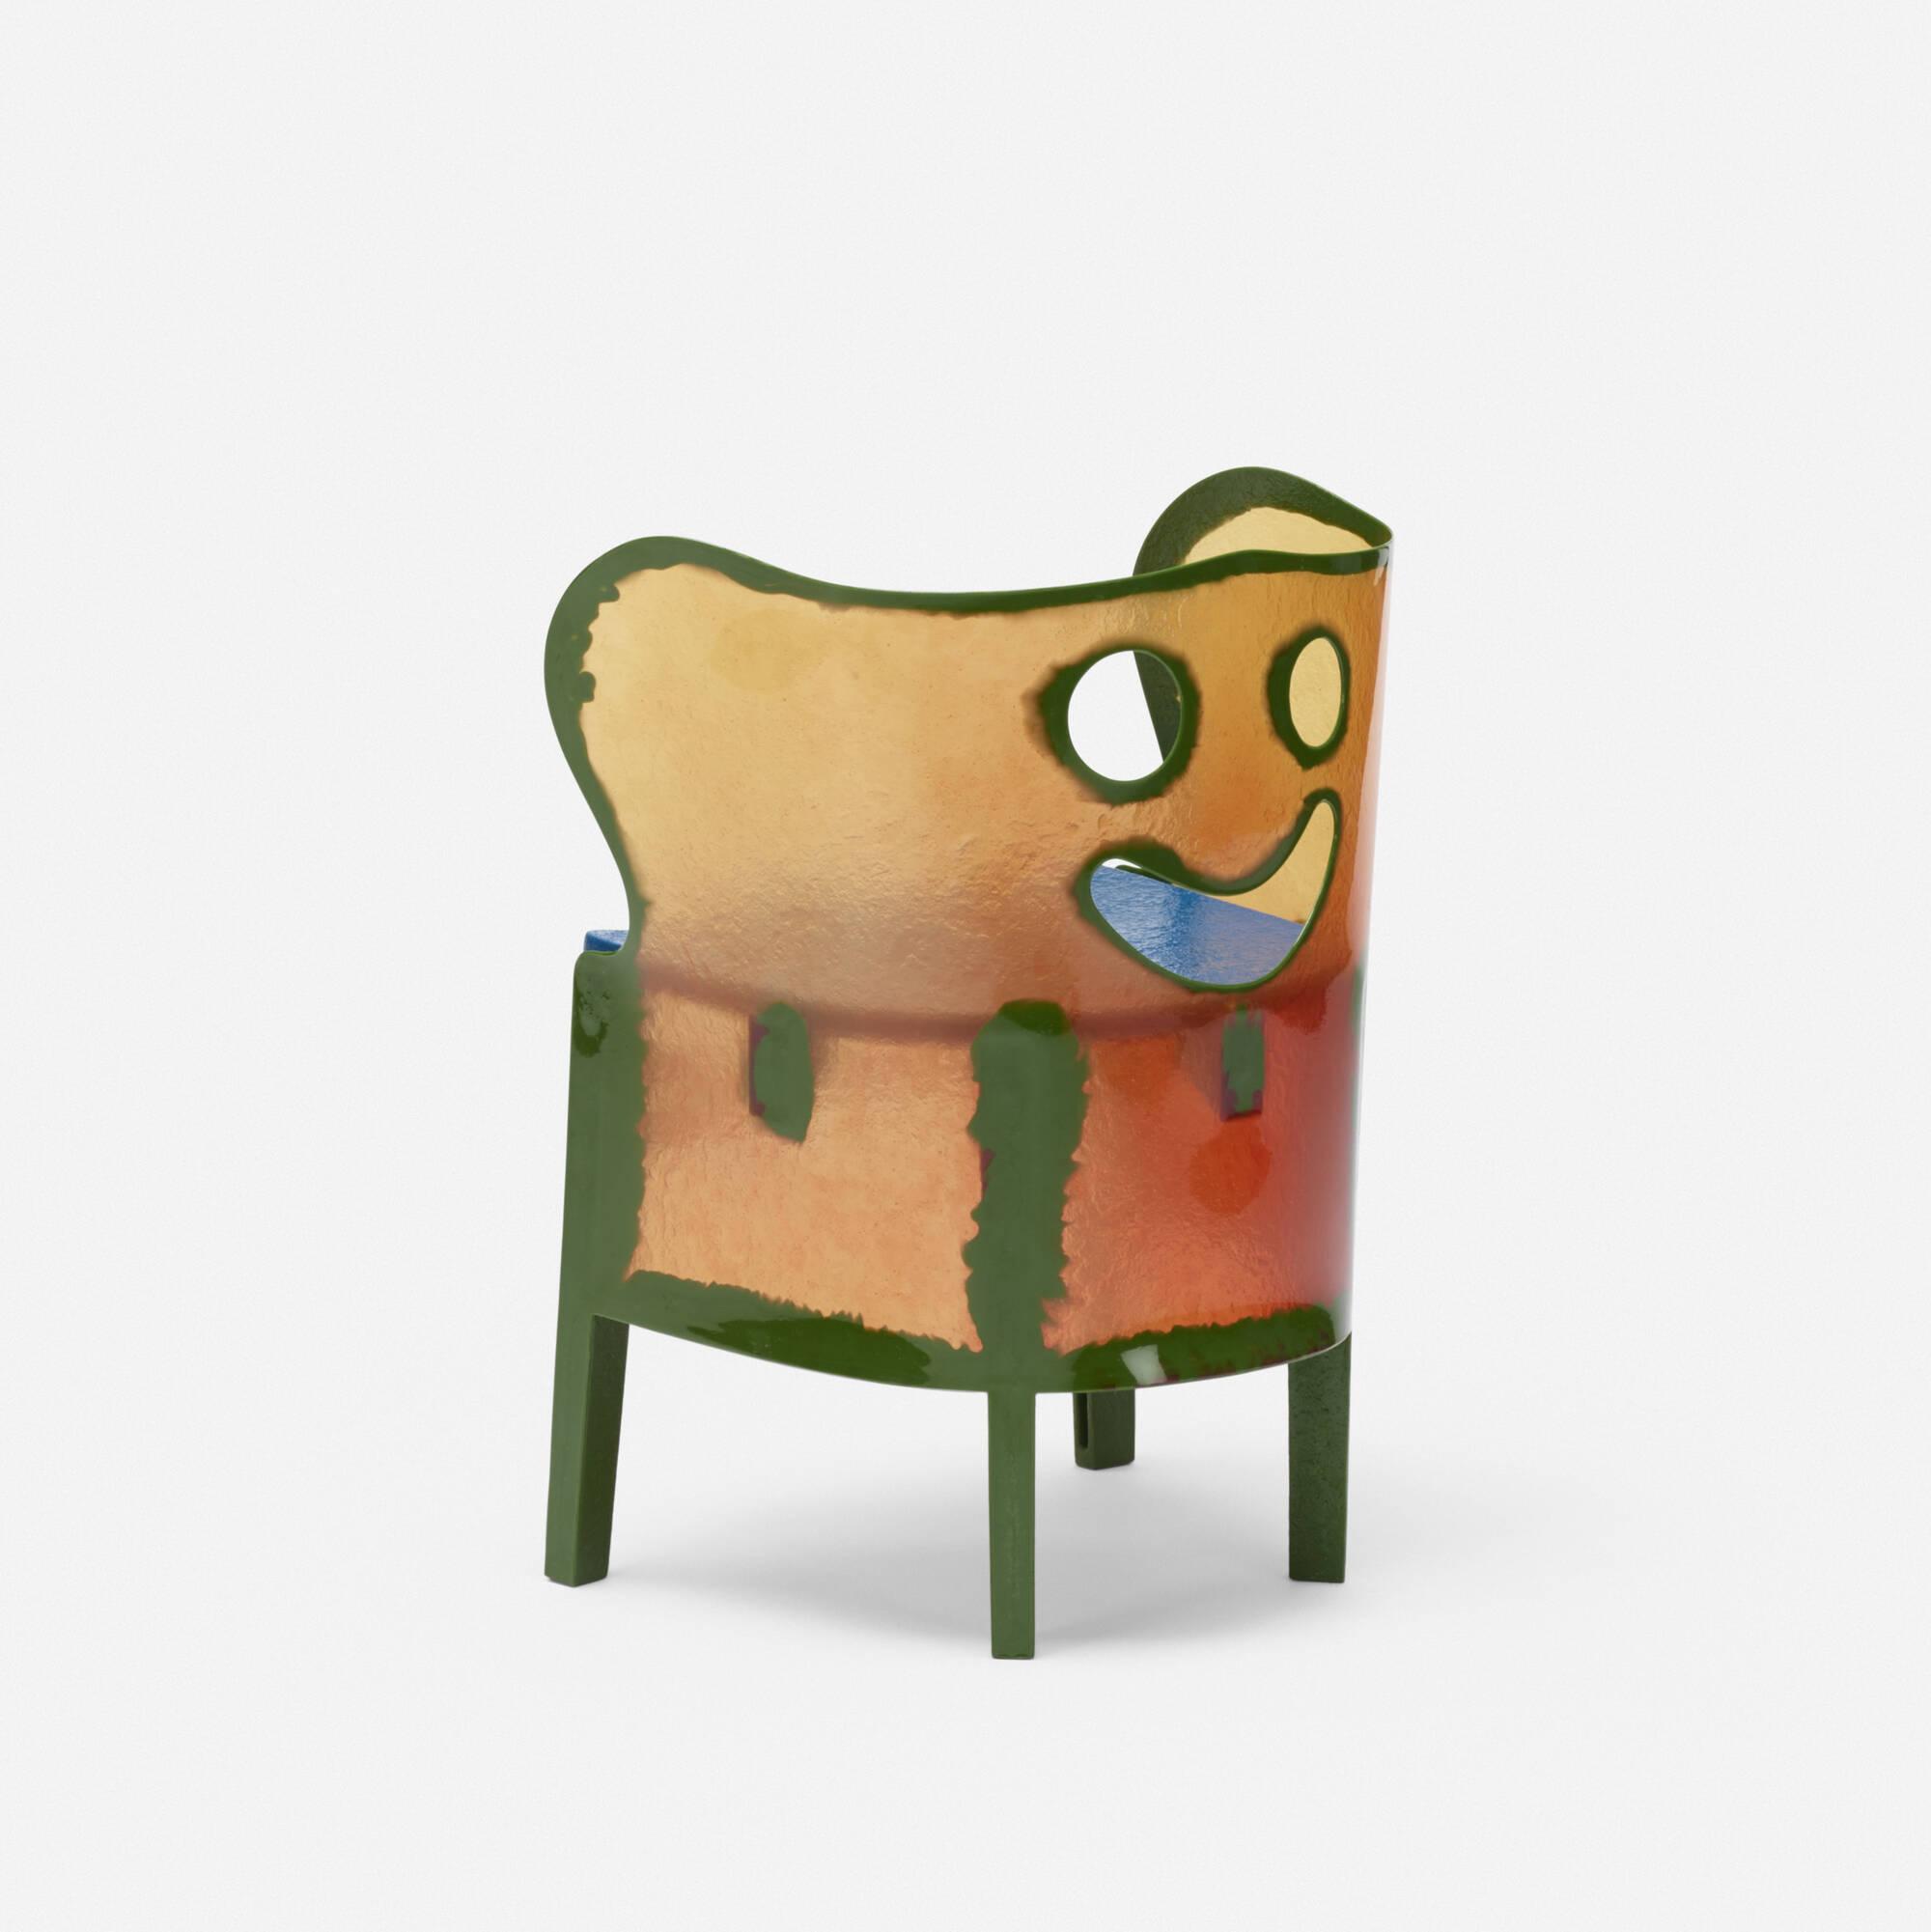 660: Gaetano Pesce / Crosby child's chair (1 of 3)